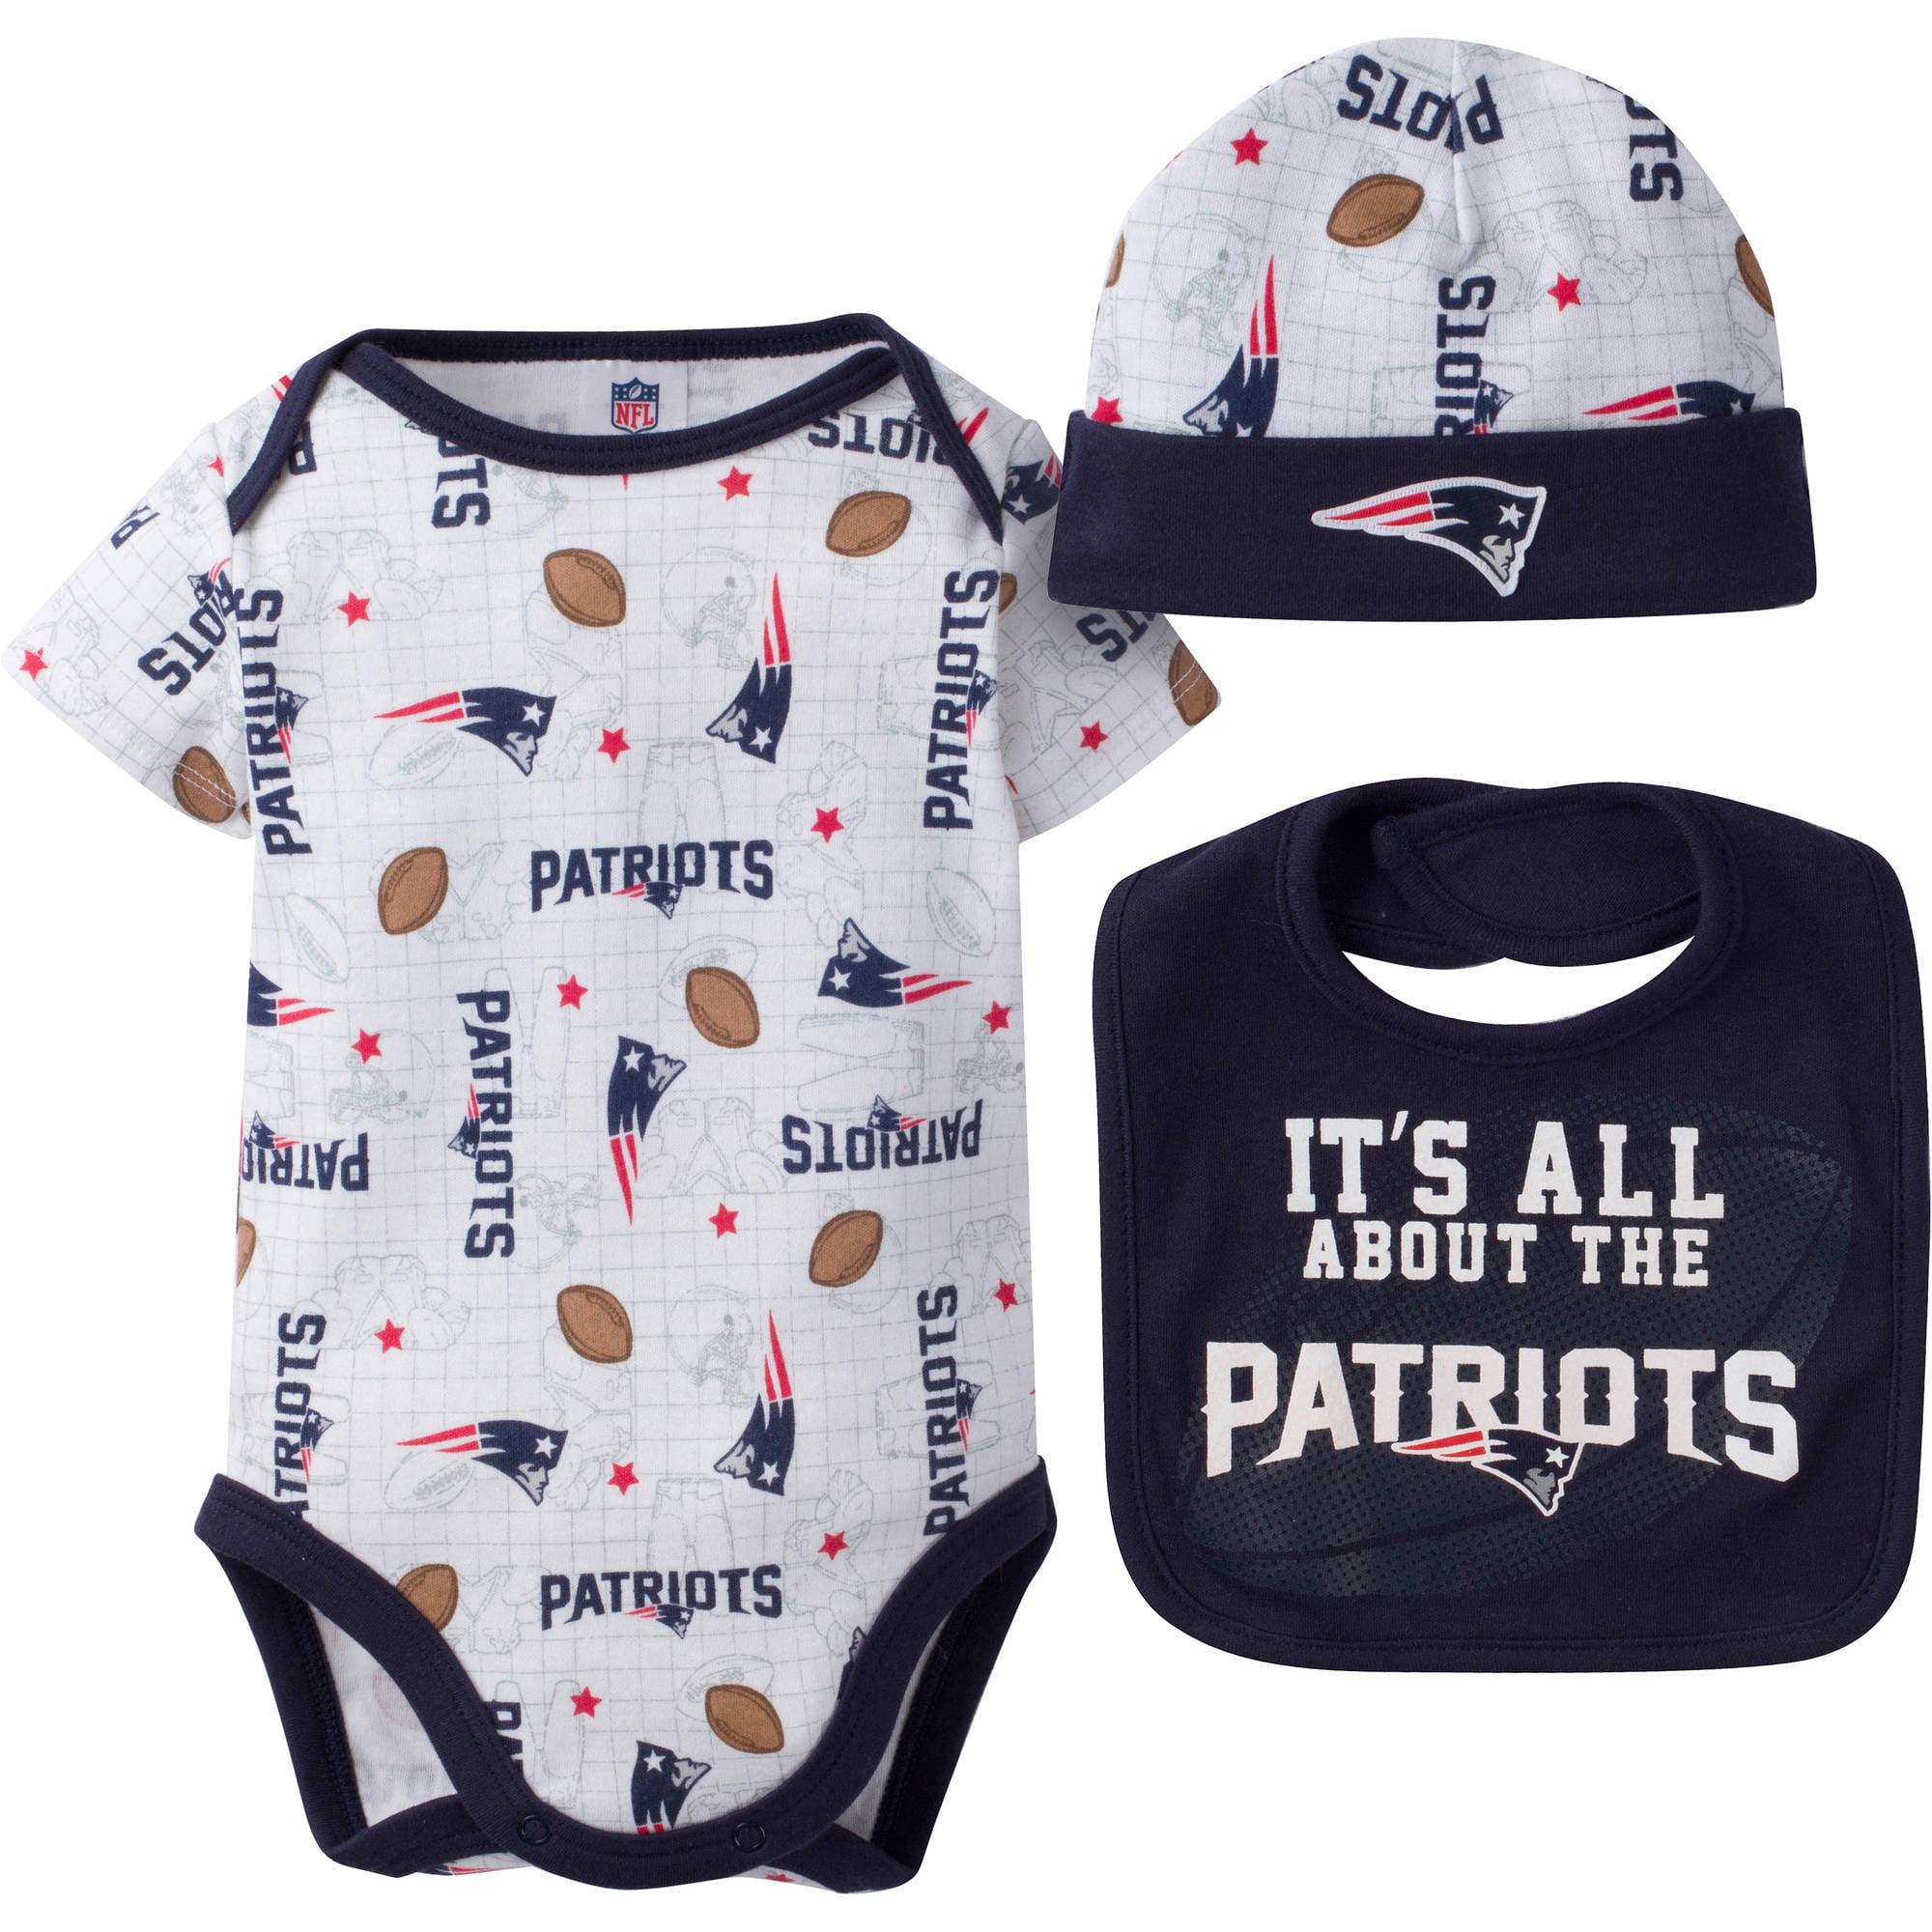 NFL New England Patriots Baby Boys Bodysuit, Bib and Cap Outfit Set, 3-Piece